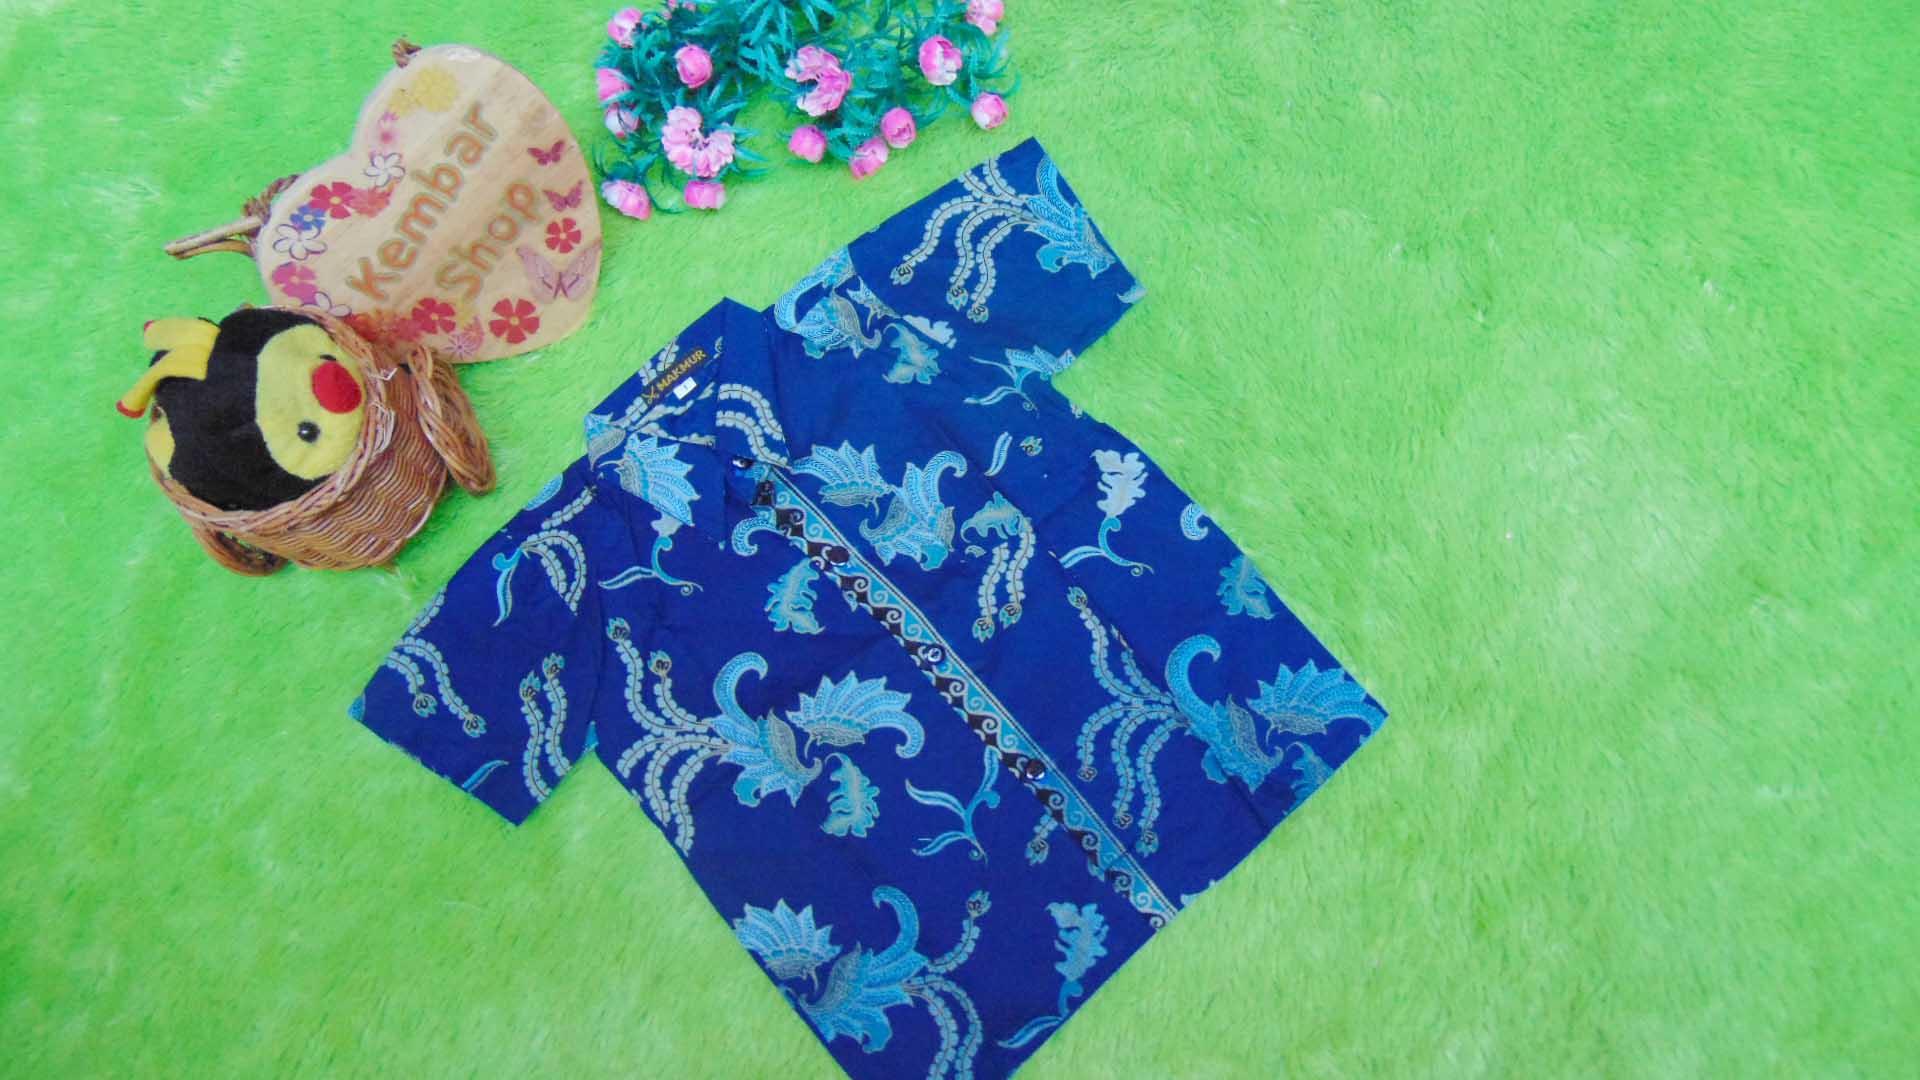 baju batik bayi anak laki-laki kemeja batik batita hem anak cowok uk 1-3th baju pesta motif sesuluran